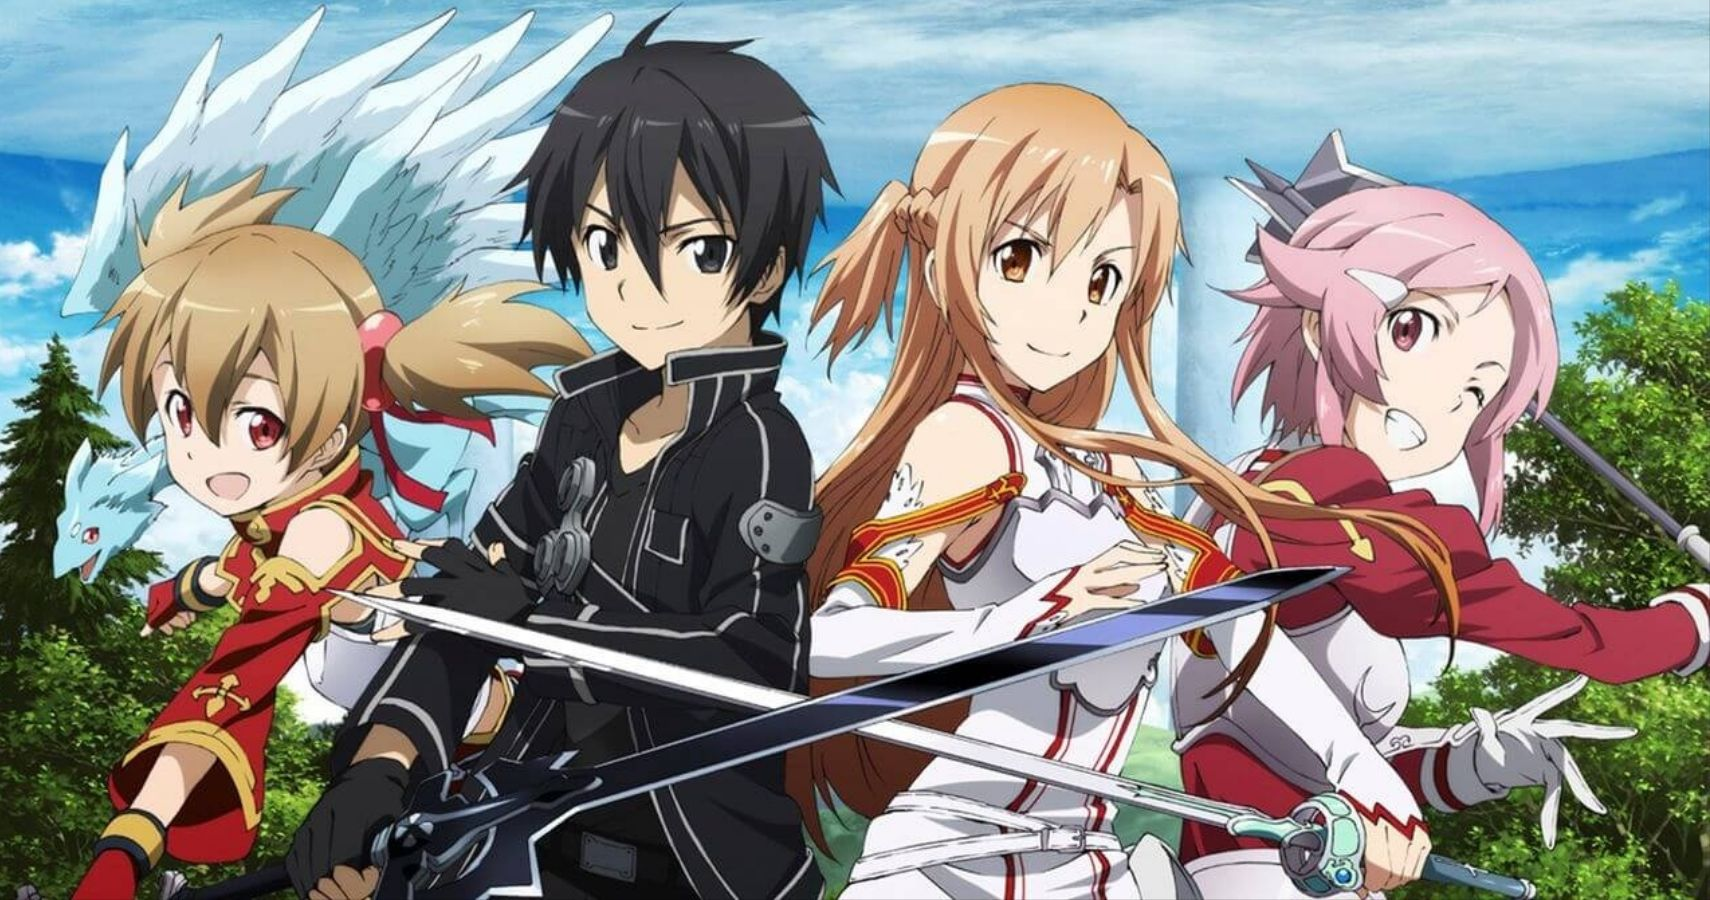 Anime on Flipboard by CollinsTumwe | Pokémon Go, Anime, TV